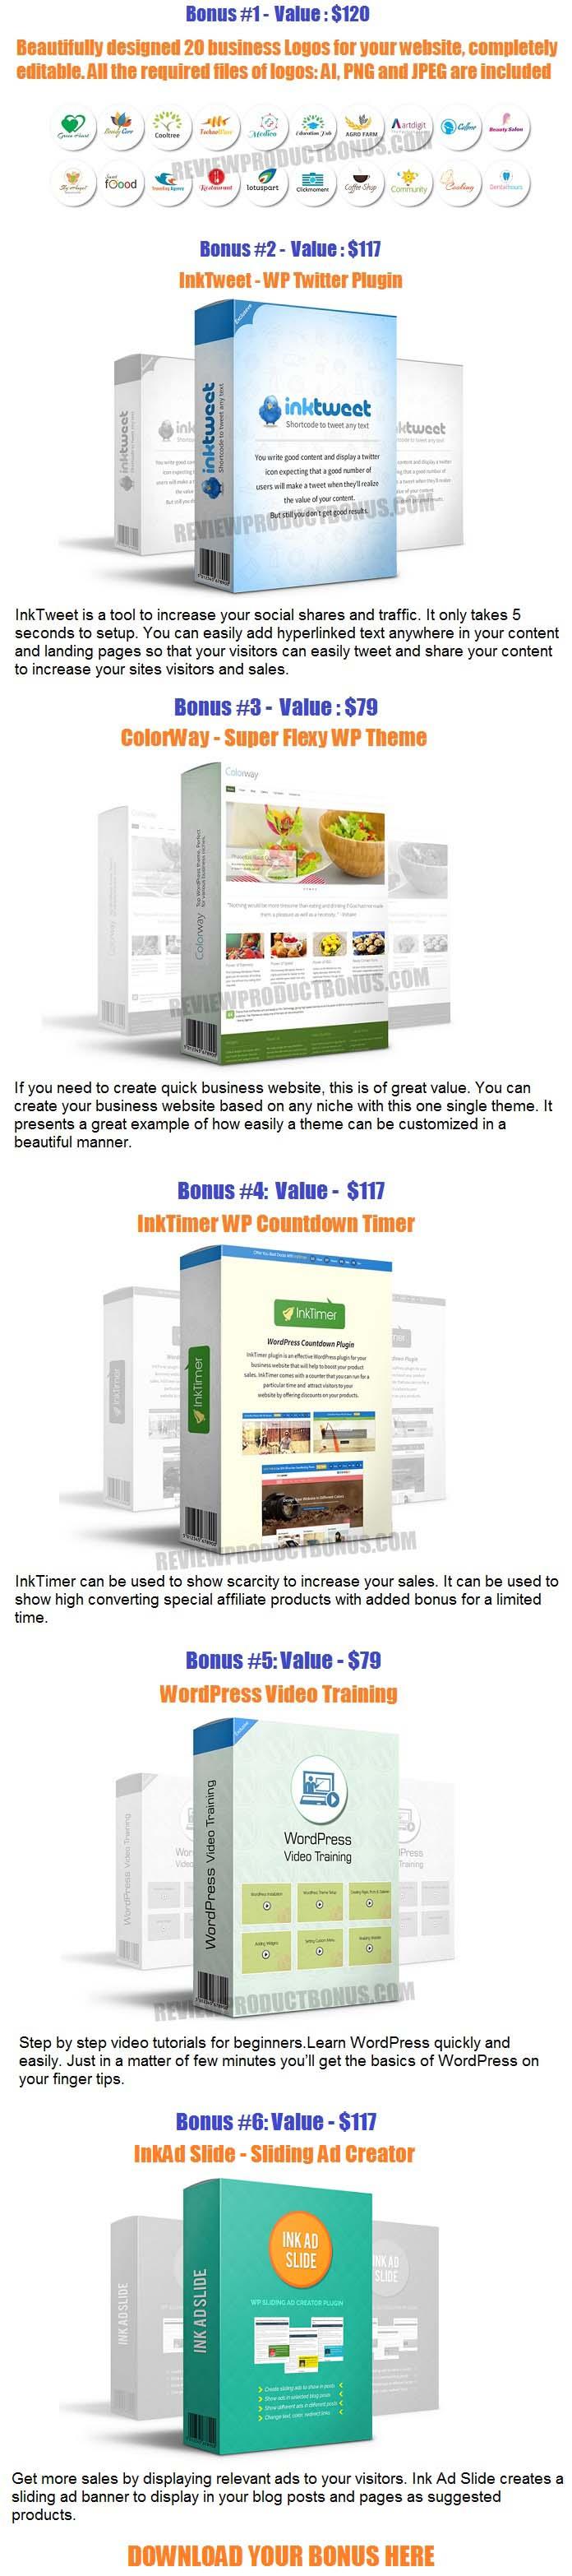 Local Business Bundle Bonus